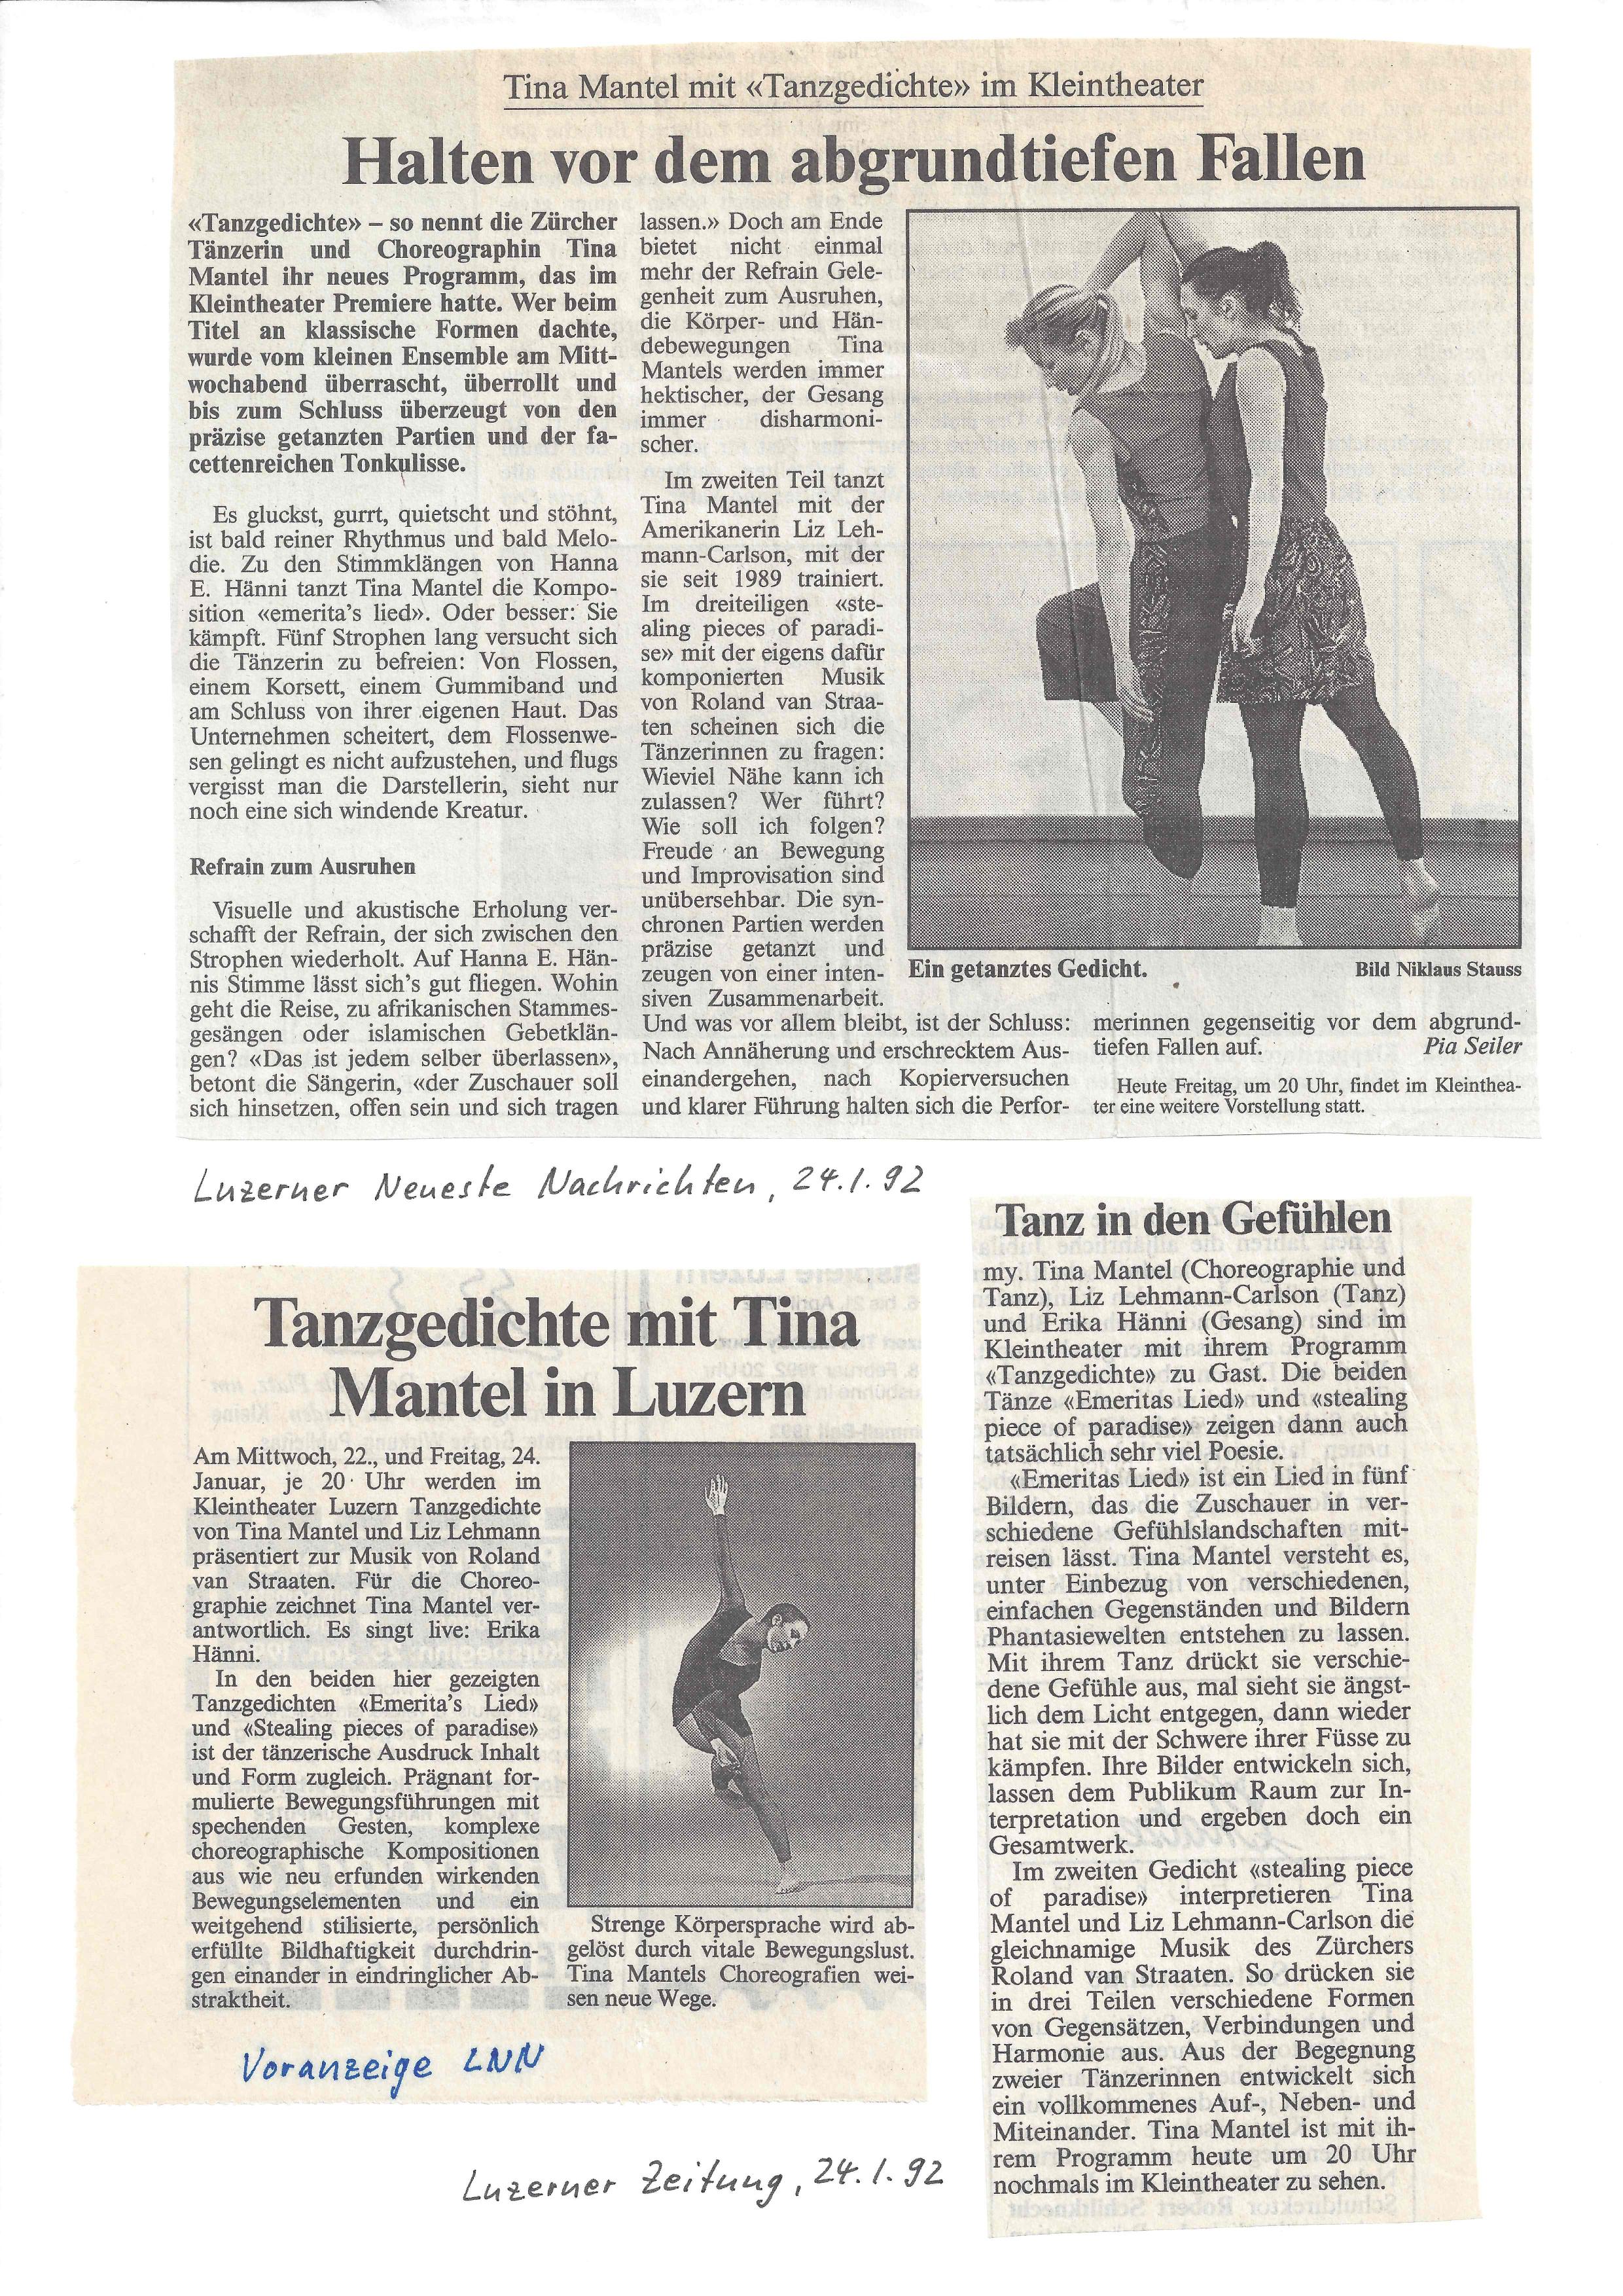 Tanzgedichte Presse Luzern.jpg